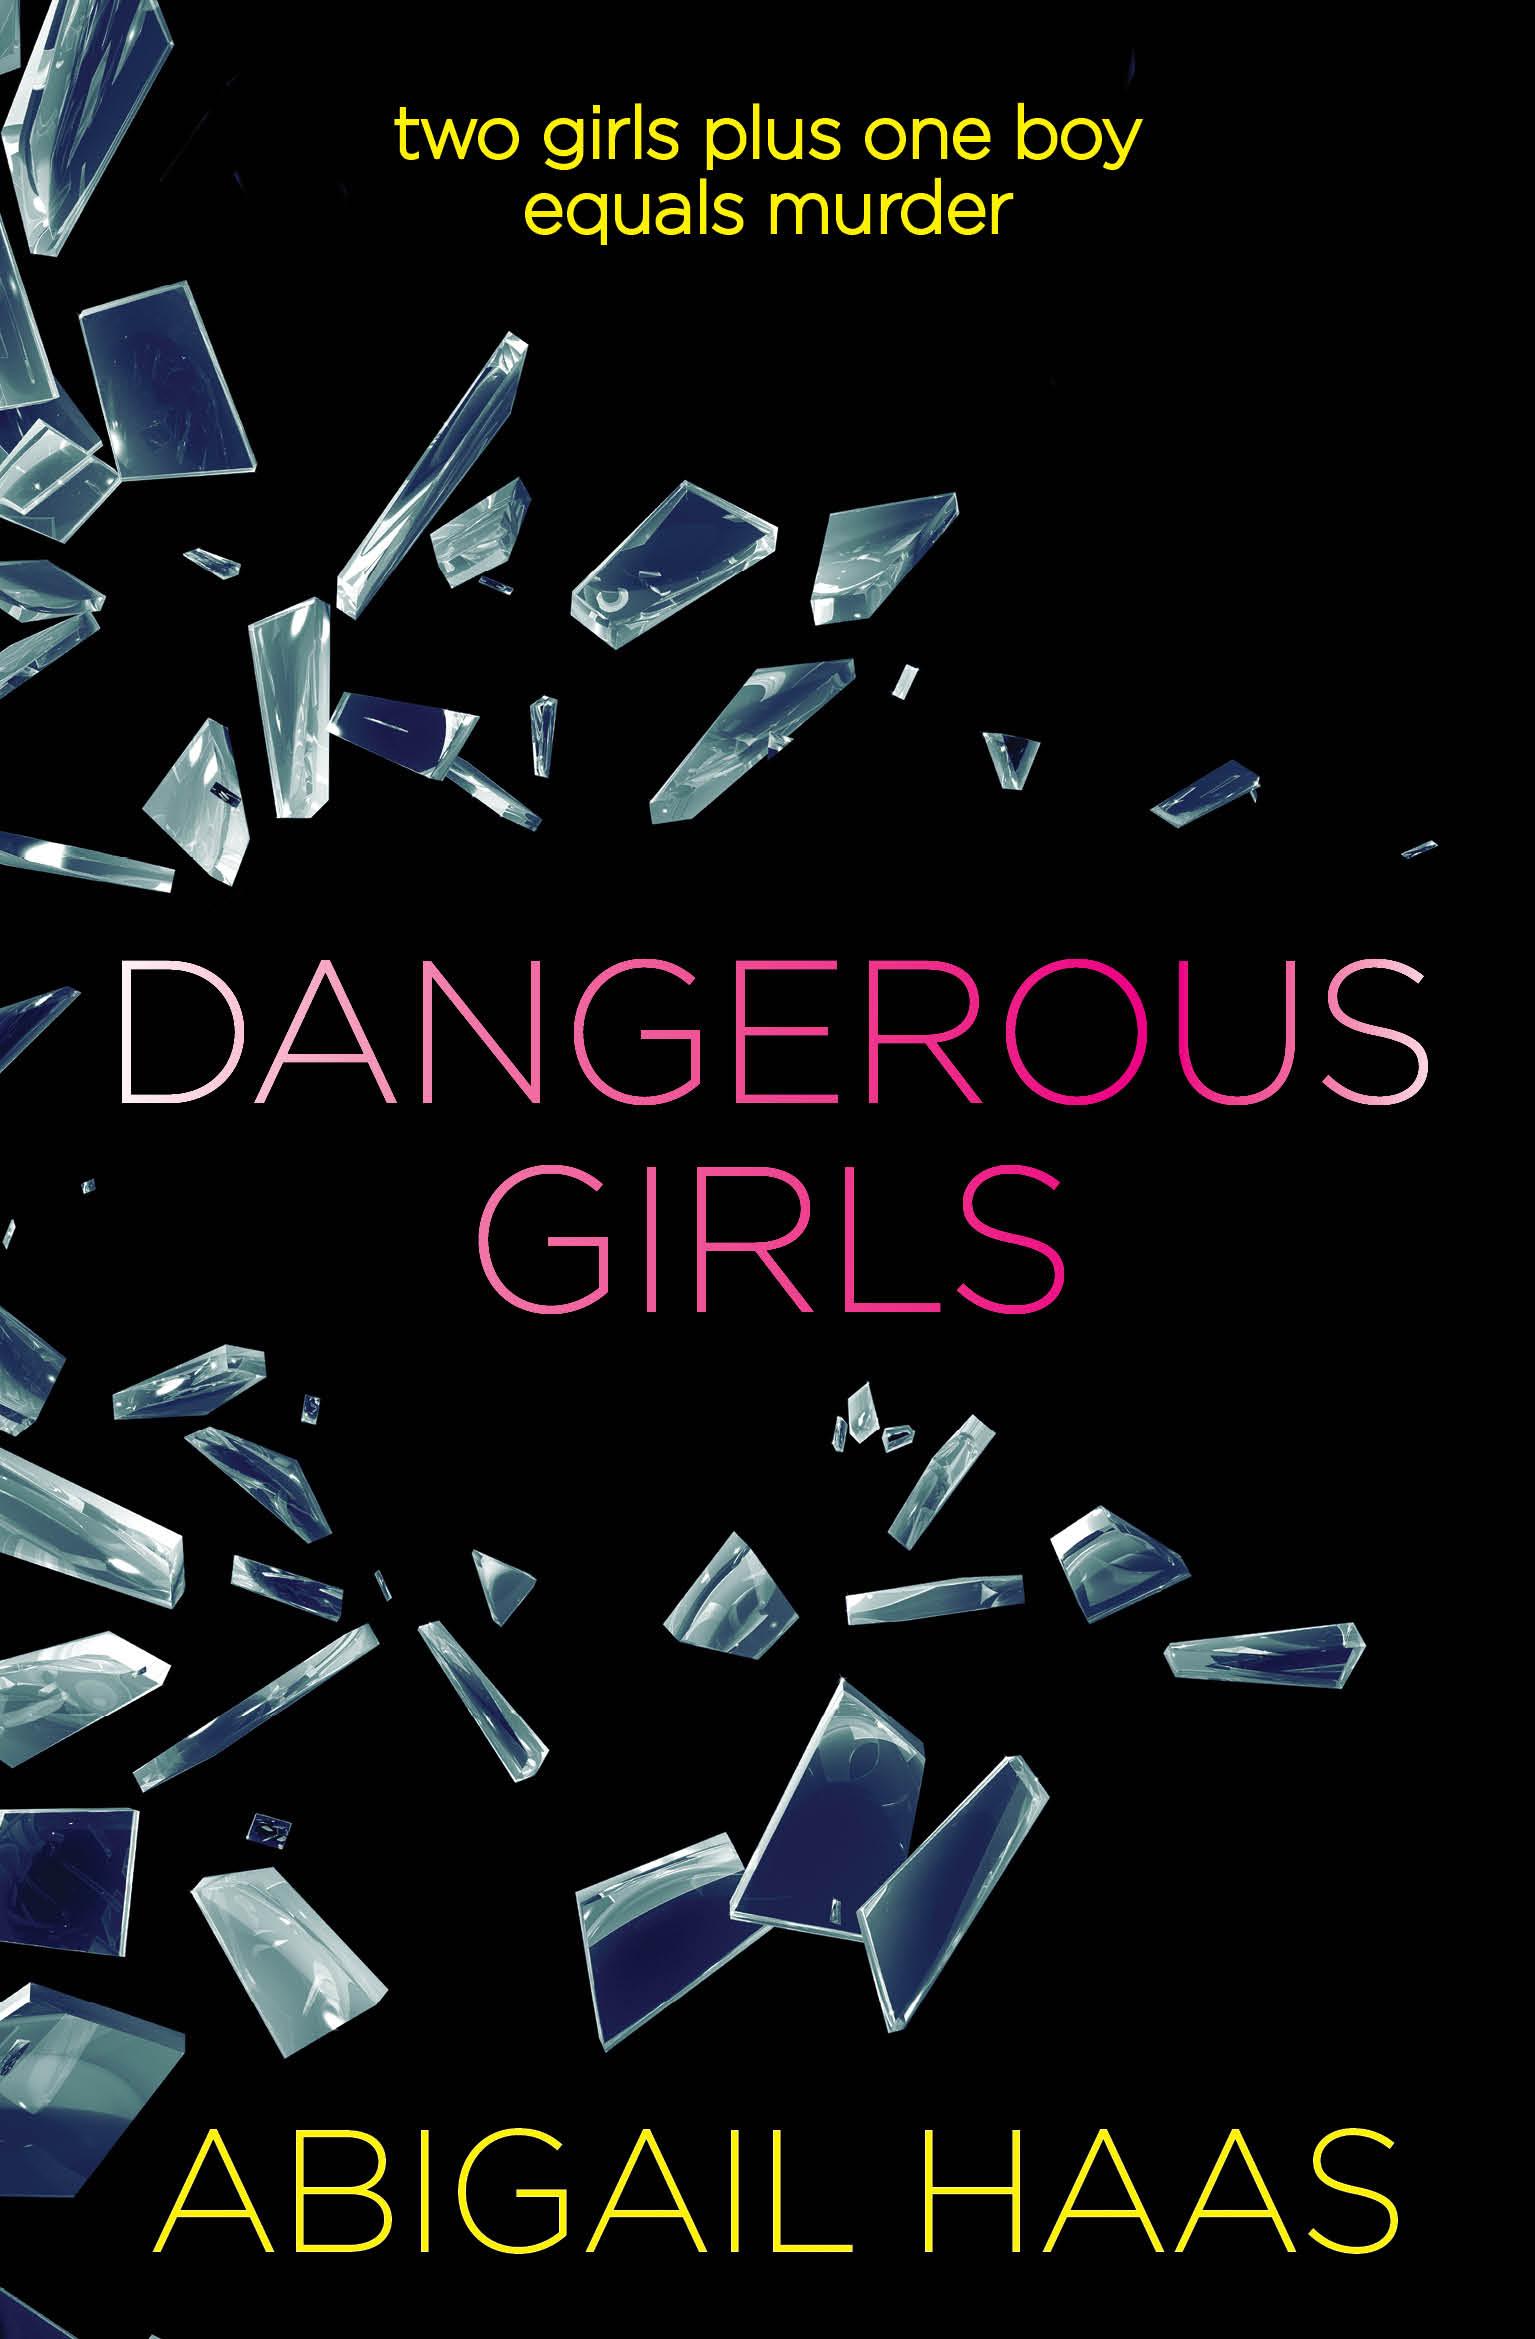 http://abbymcdonald.com/wp-content/uploads/2013/06/Dangerous-Girls-UK-12.jpg